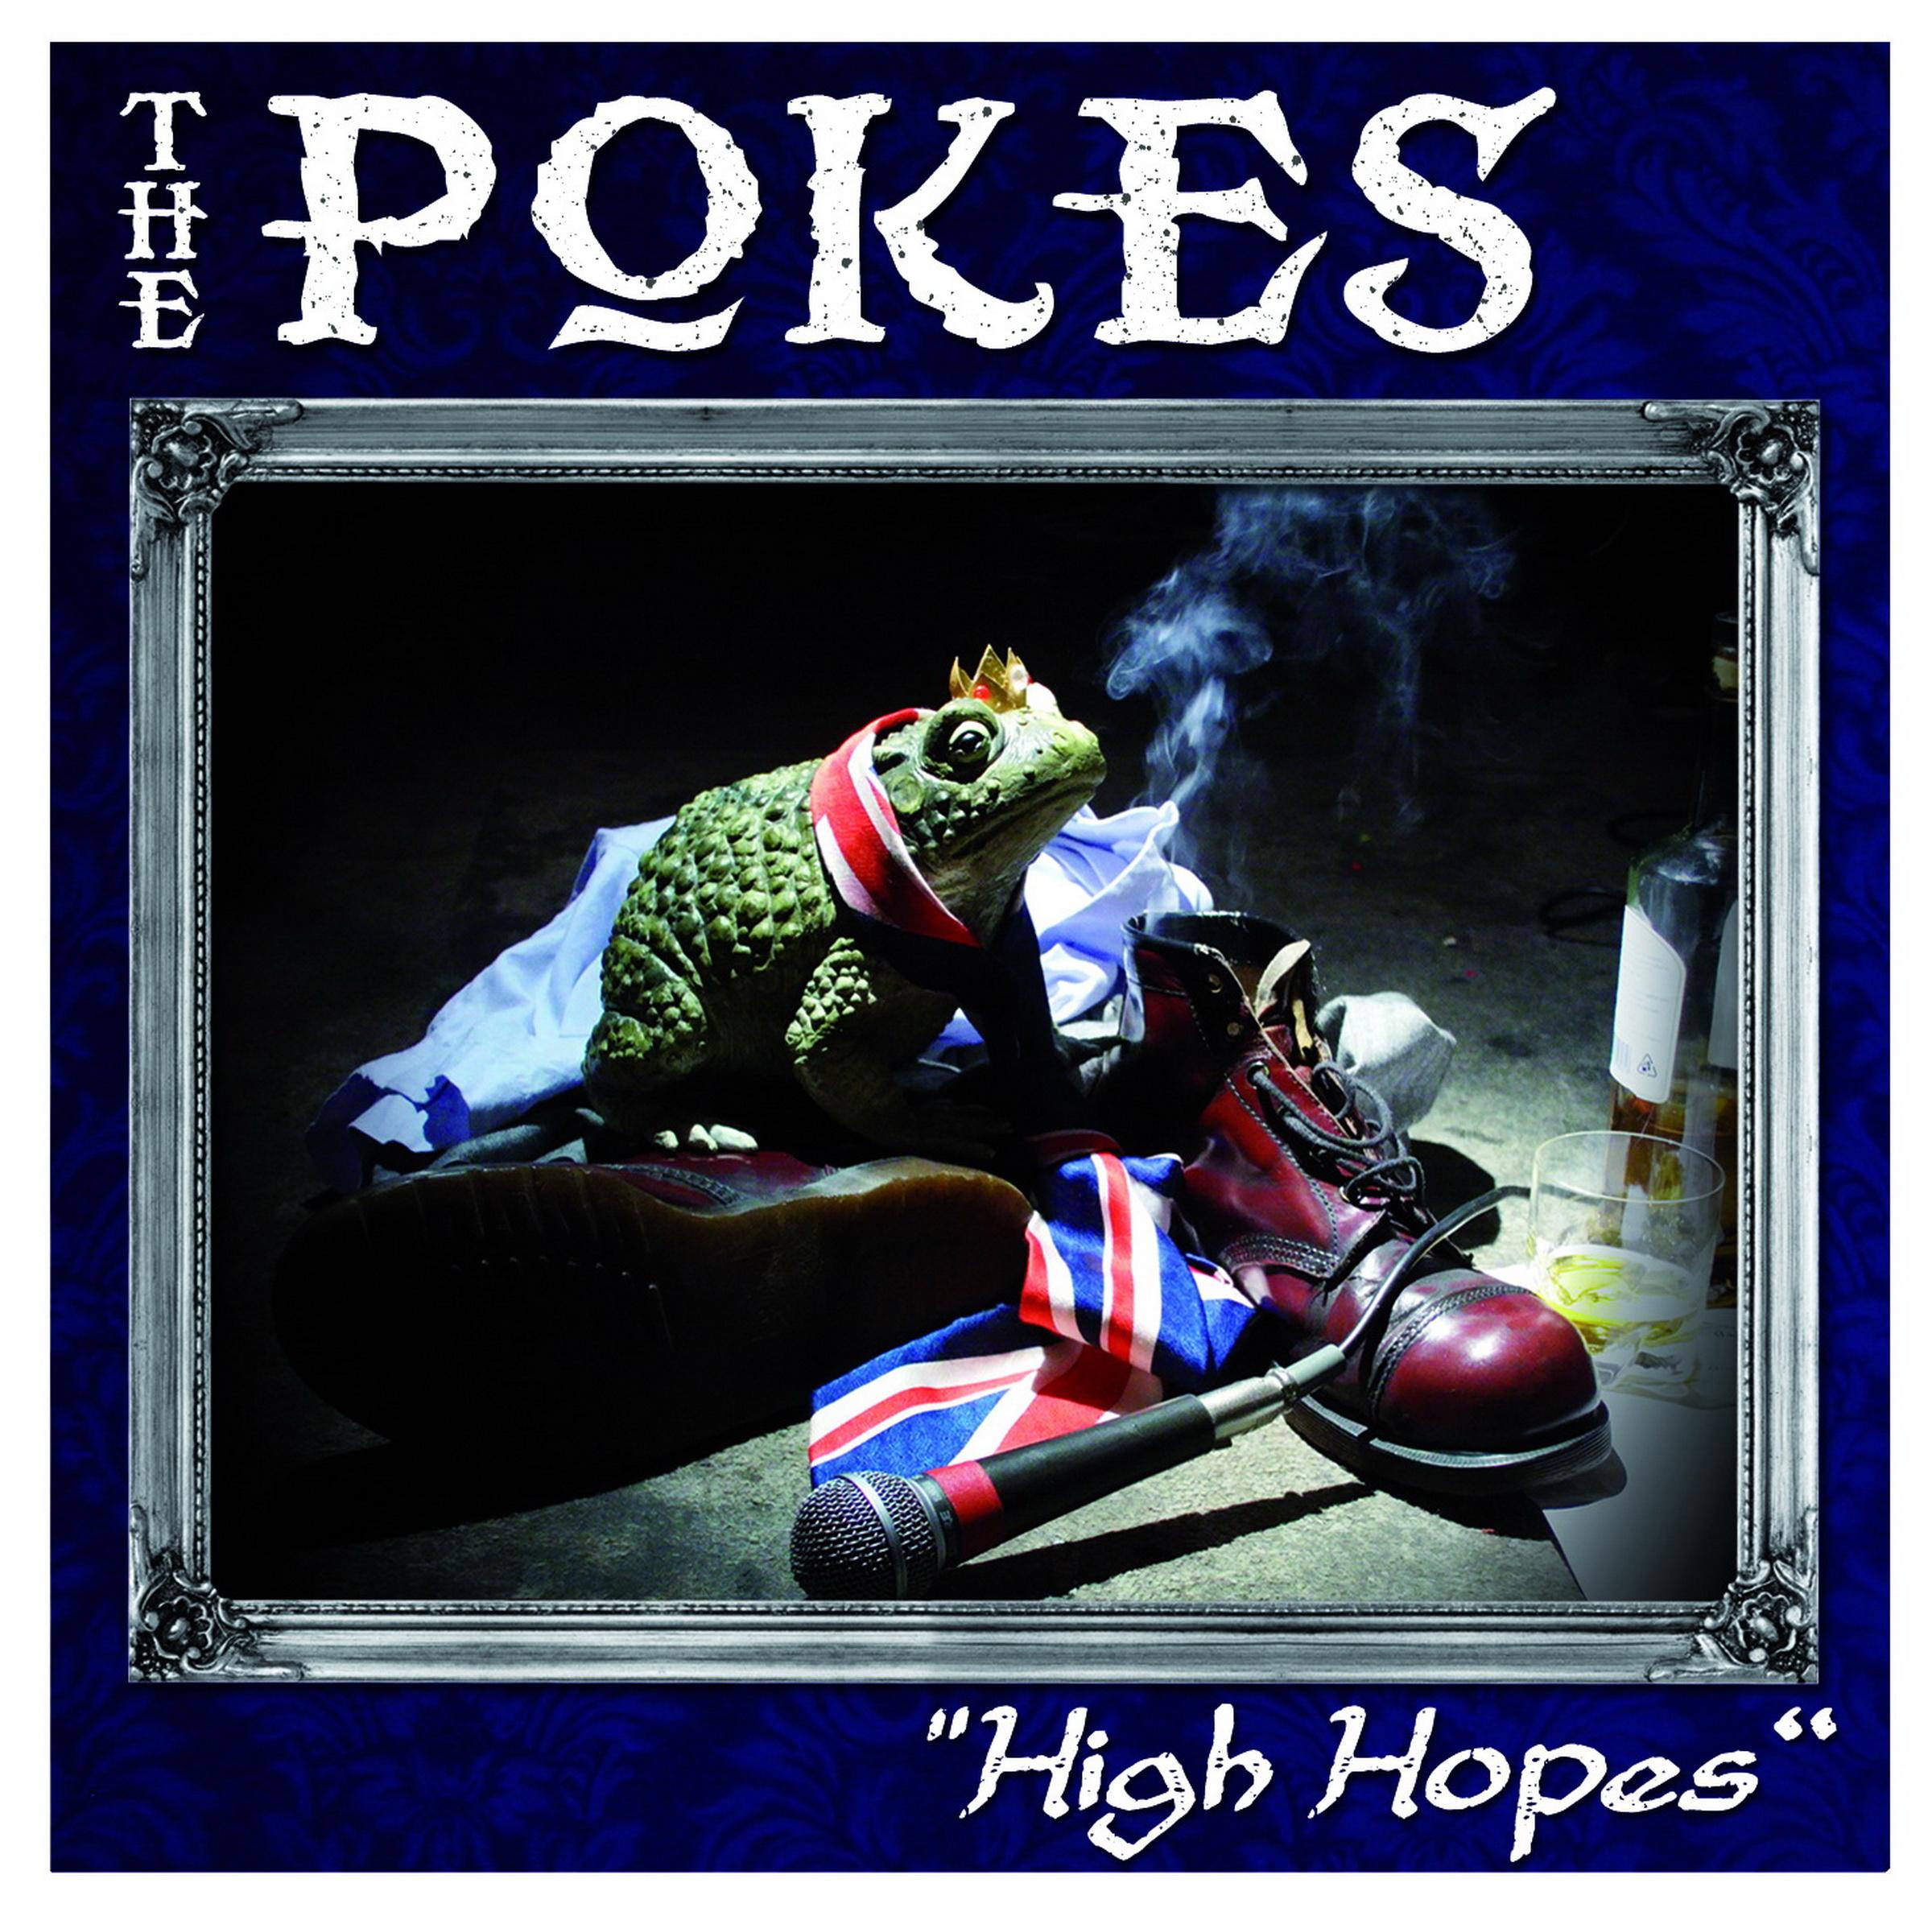 highhopes